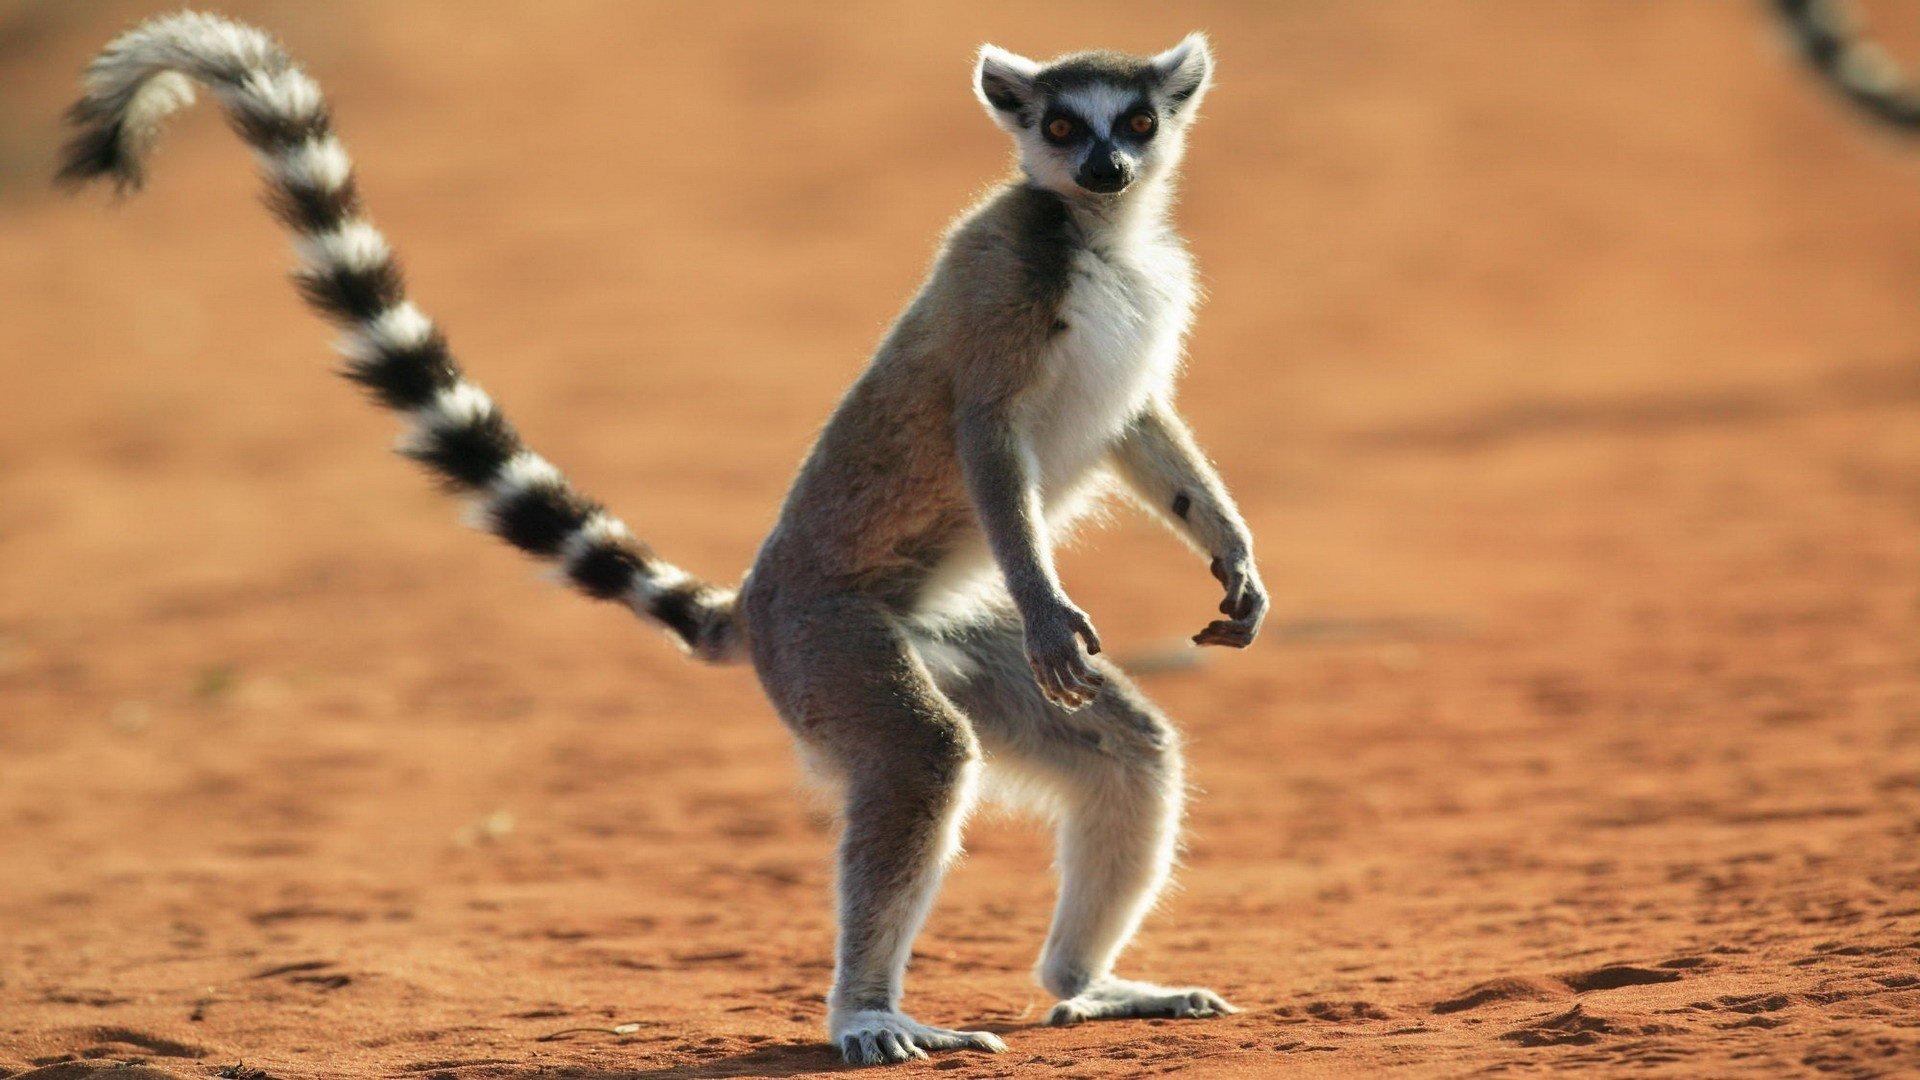 Lemur wallpaper photo